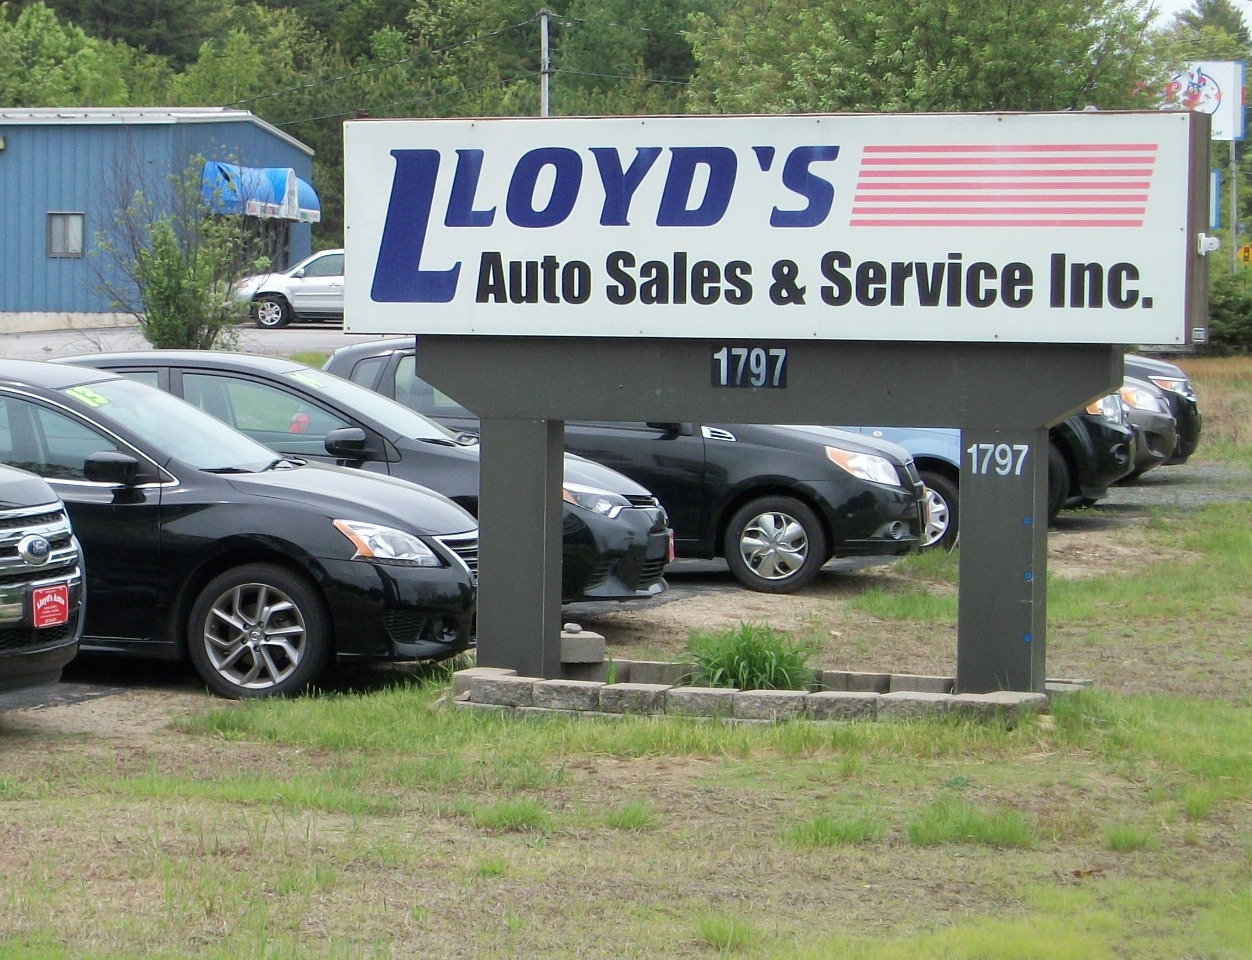 Lloyds Auto Sales & SVC